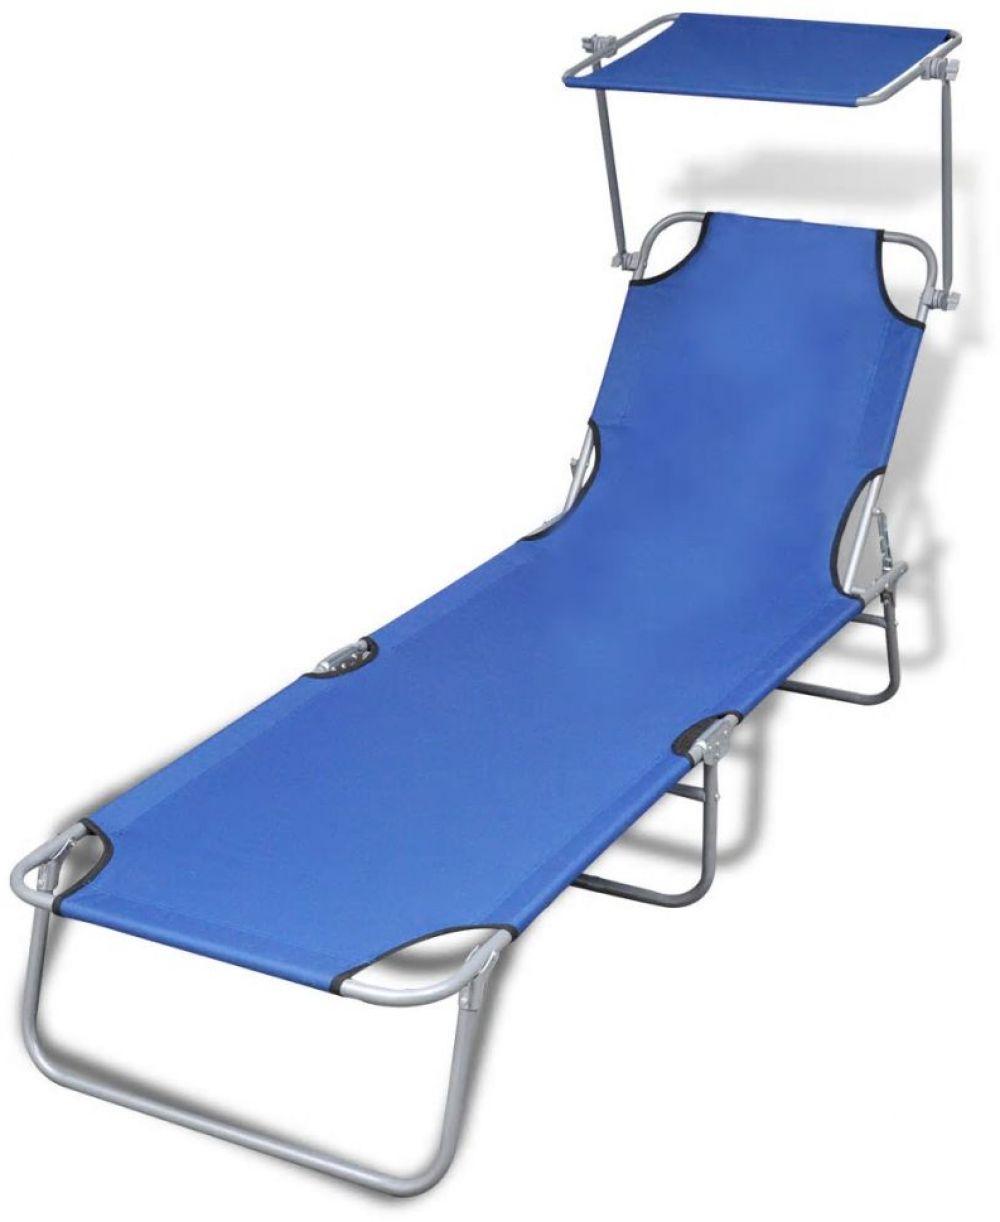 Garden sun lounger foldable with canopy patio outdoor blue